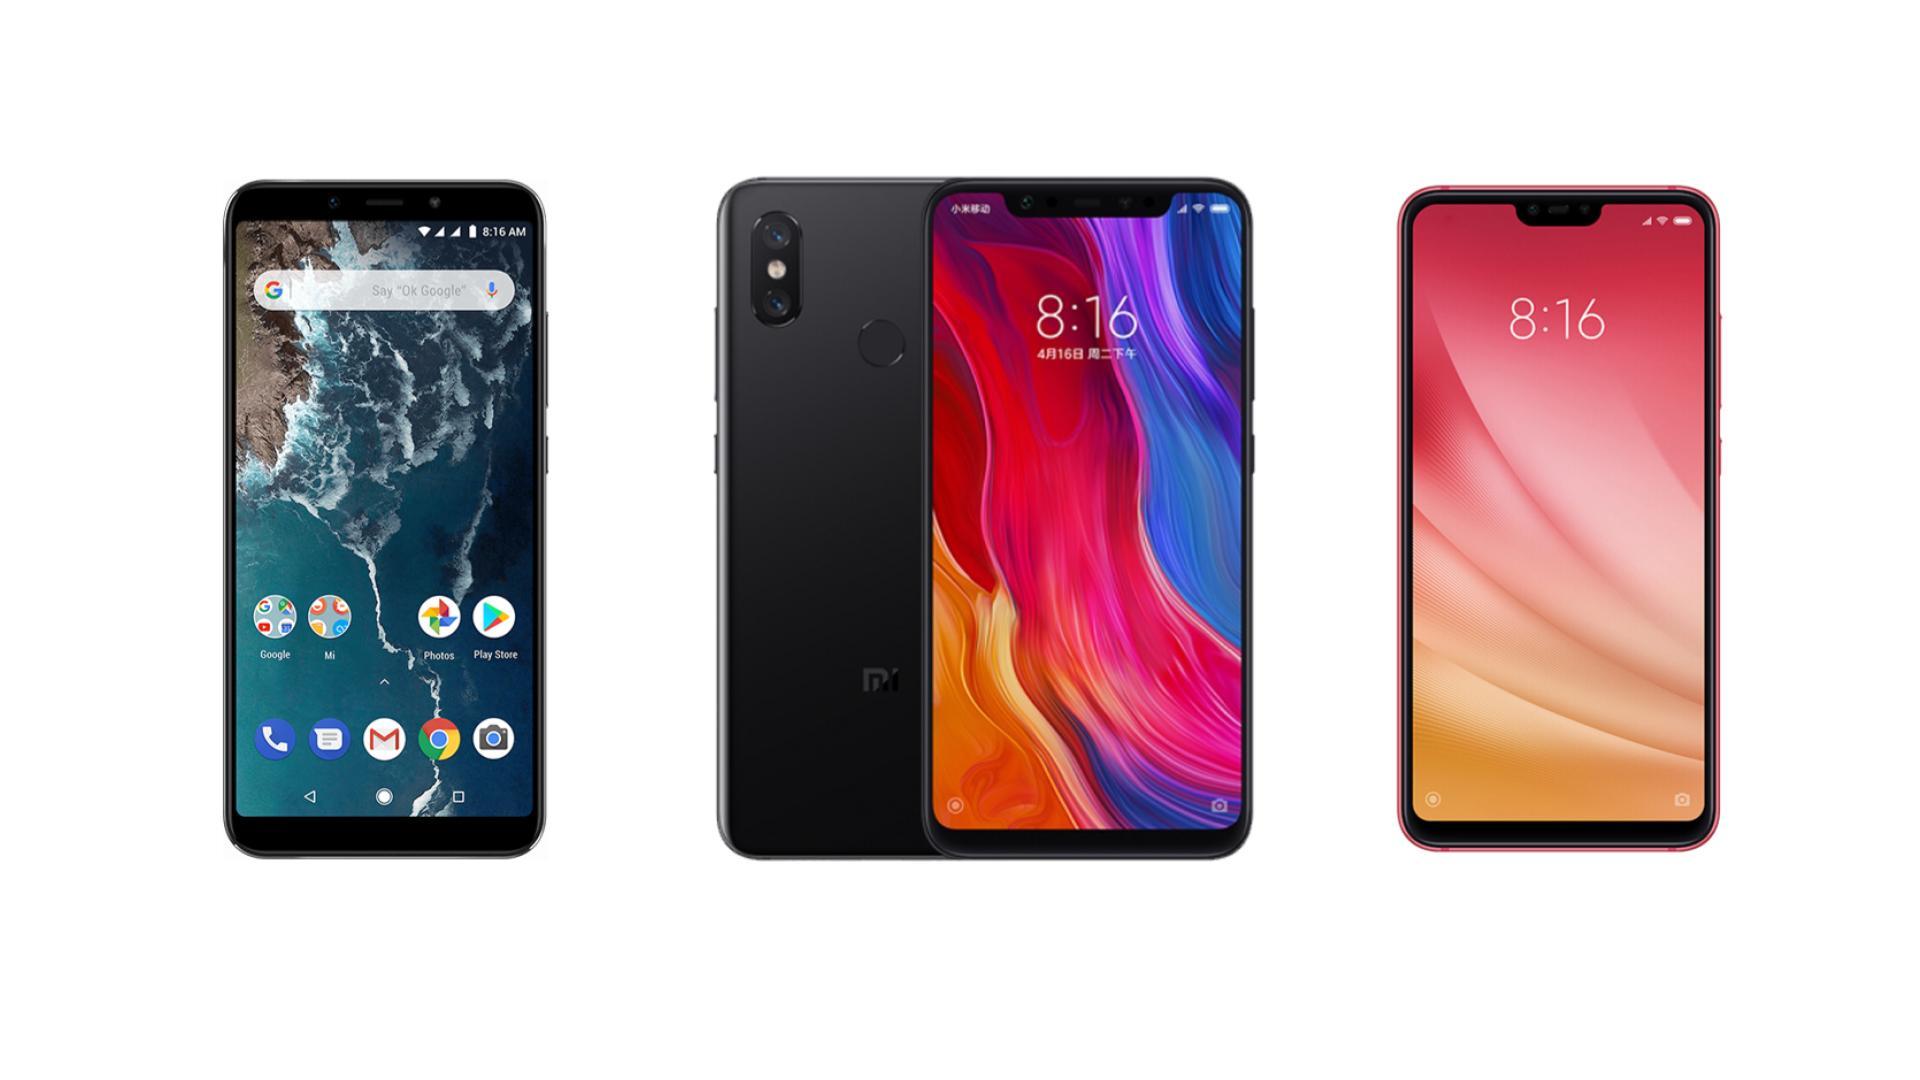 Xiaomi Mi 8 à 336 euros, Mi 8 Lite à 190 euros et Mi A2 à 164 euros sur GearBest